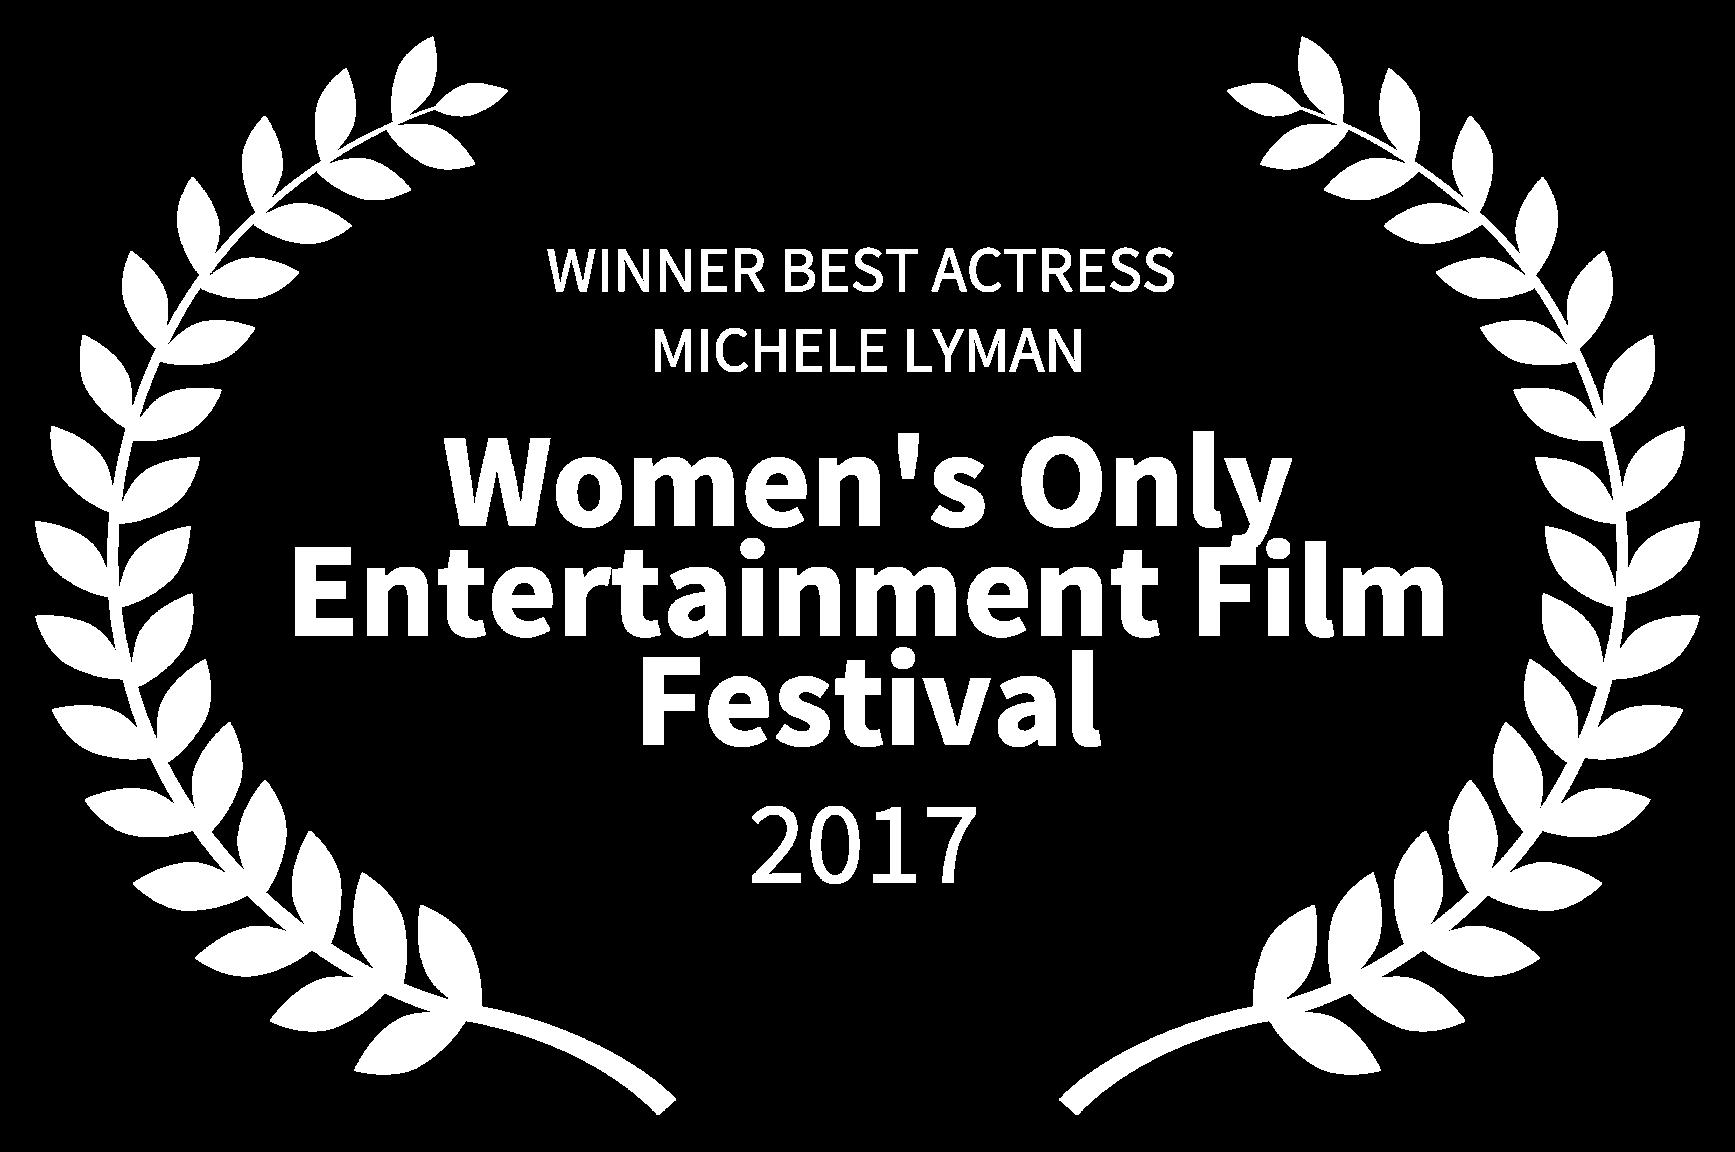 WINNER BEST ACTRESS  MICHELE LYMAN - Womens Only Entertainment Film Festival - 2017.png